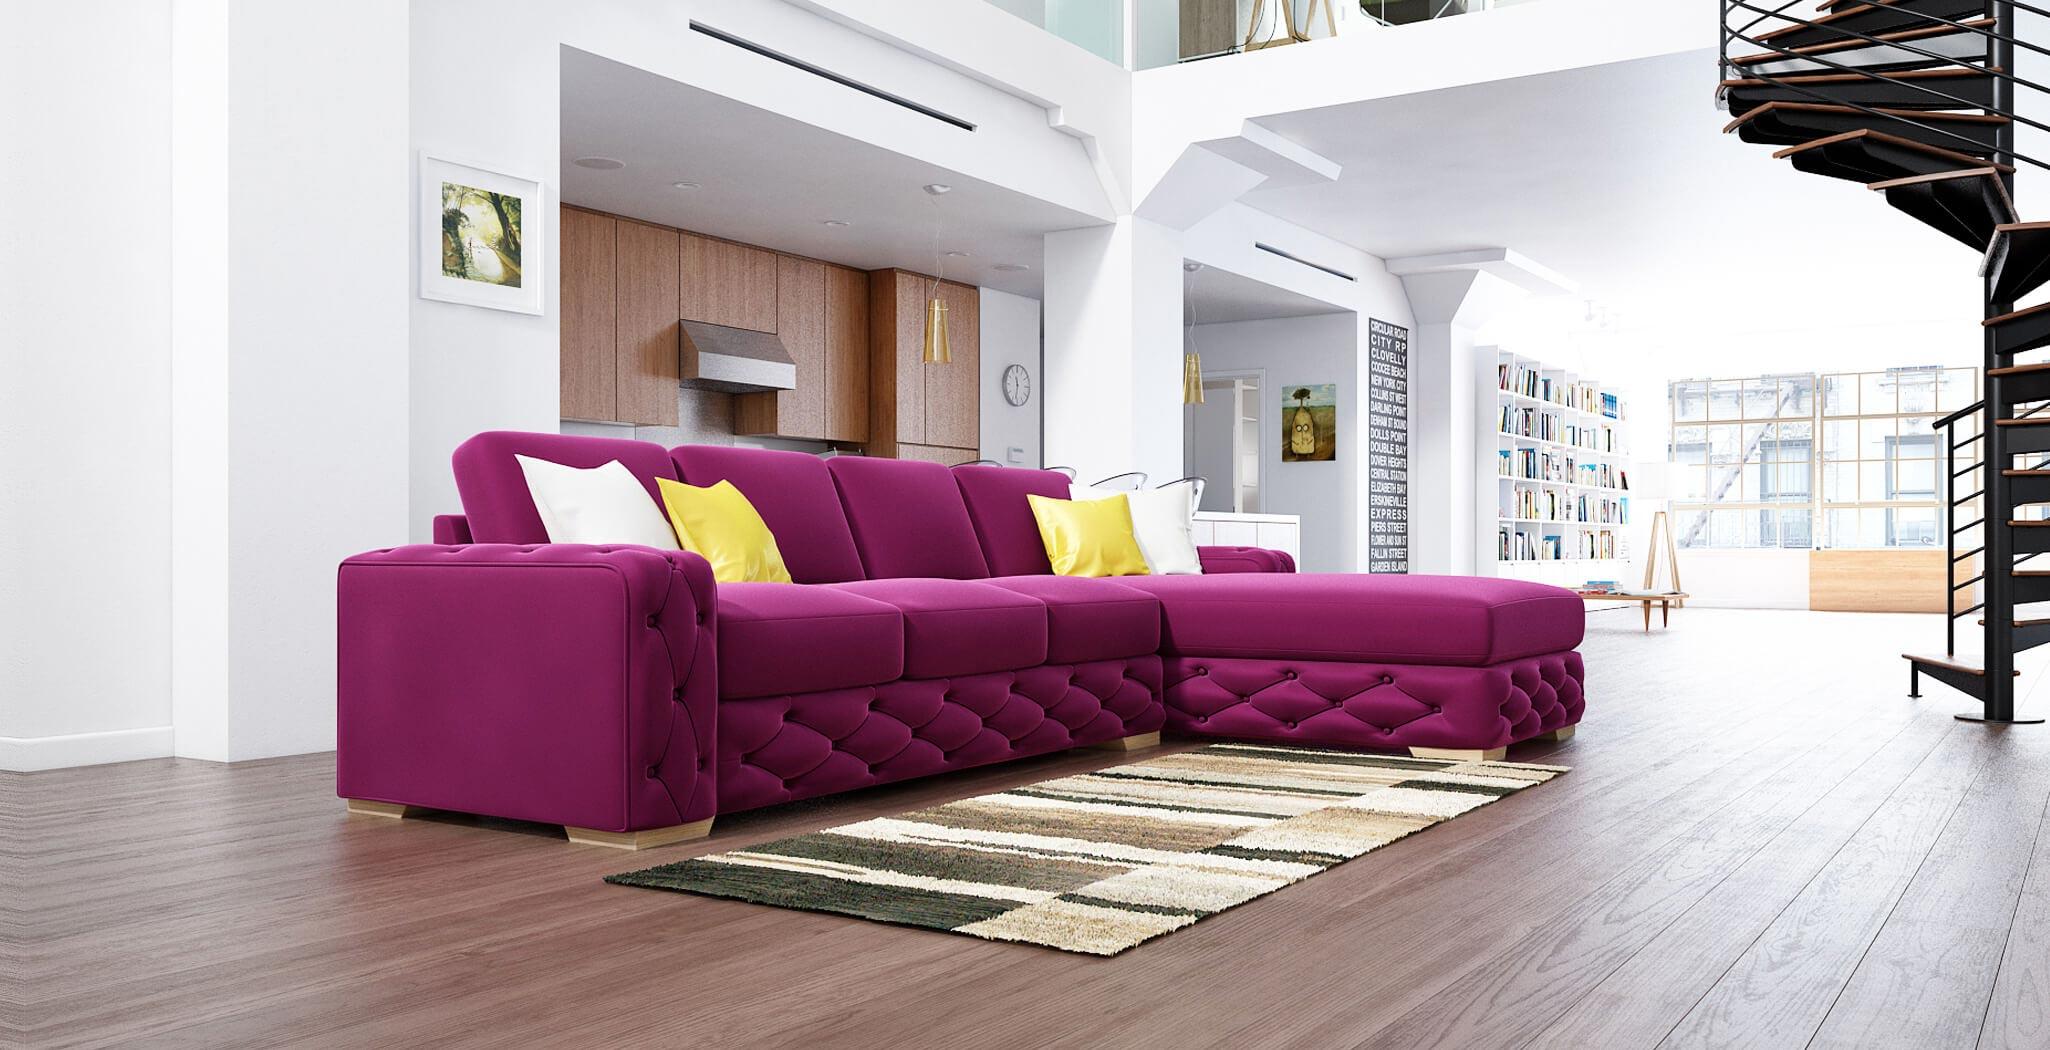 windsor panel furniture gallery 3